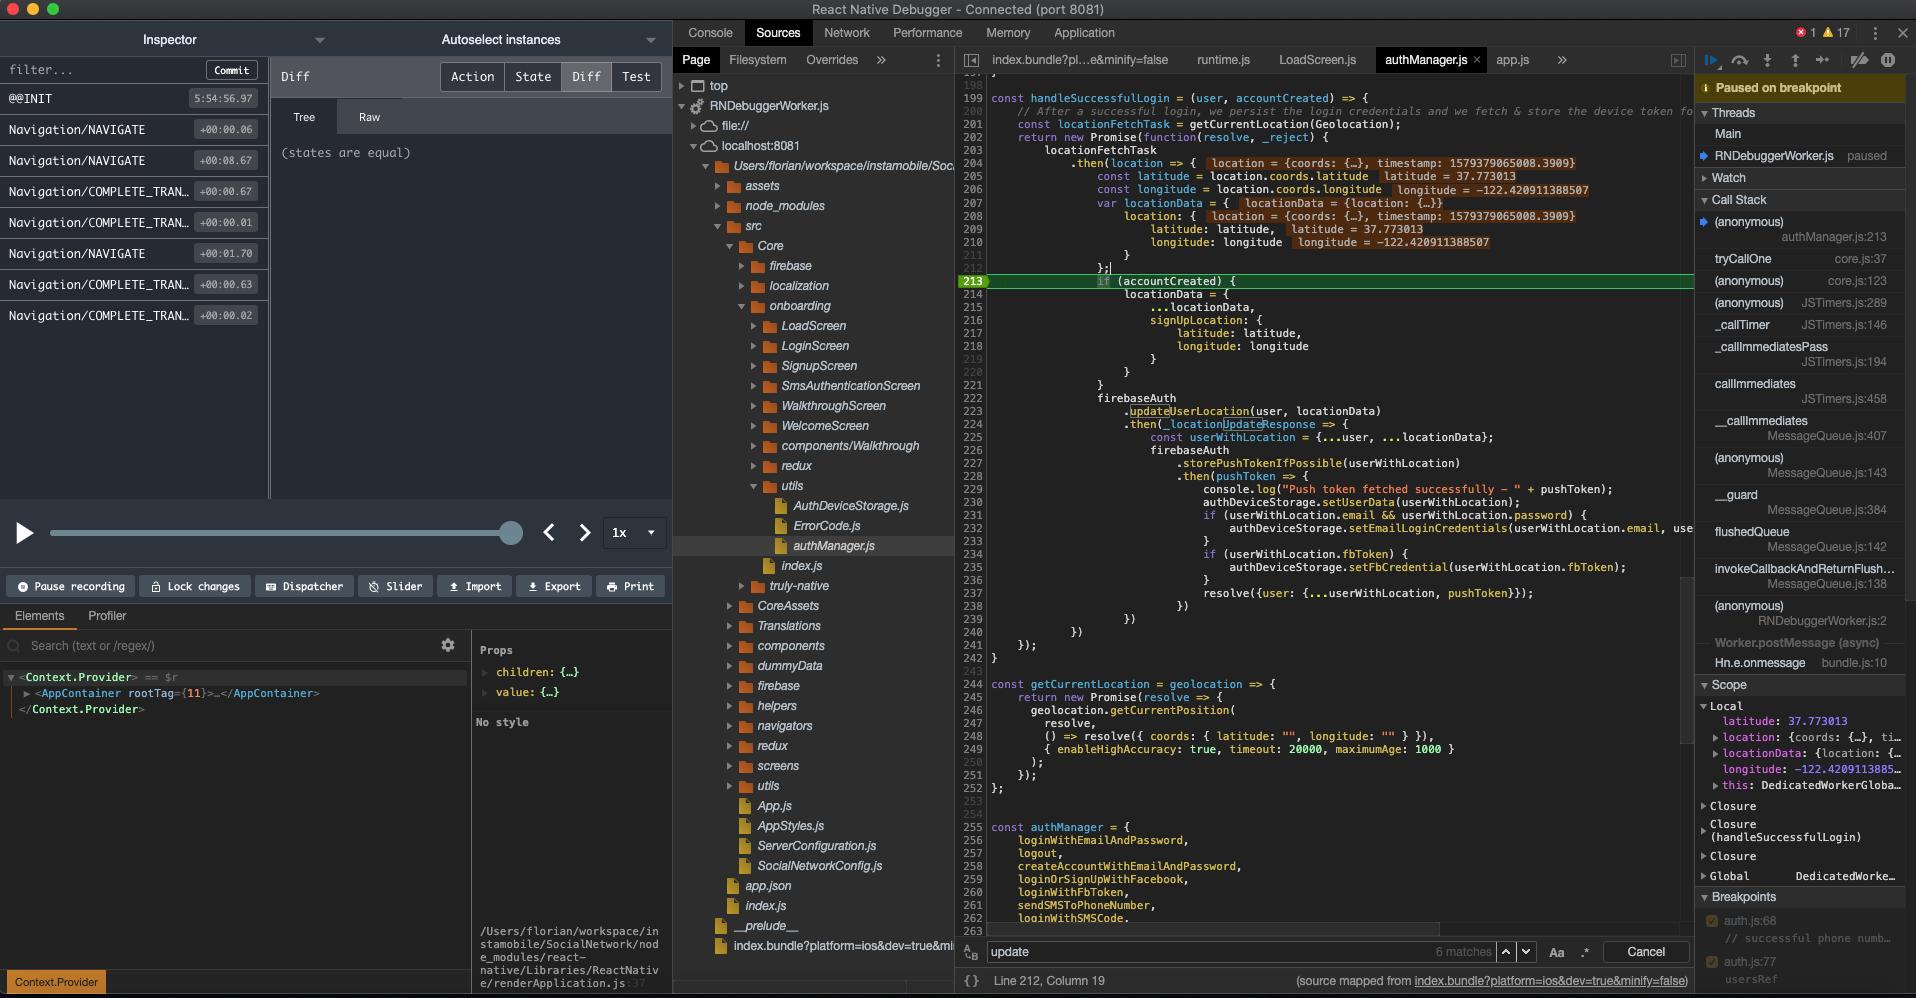 react native debugger breakpoints